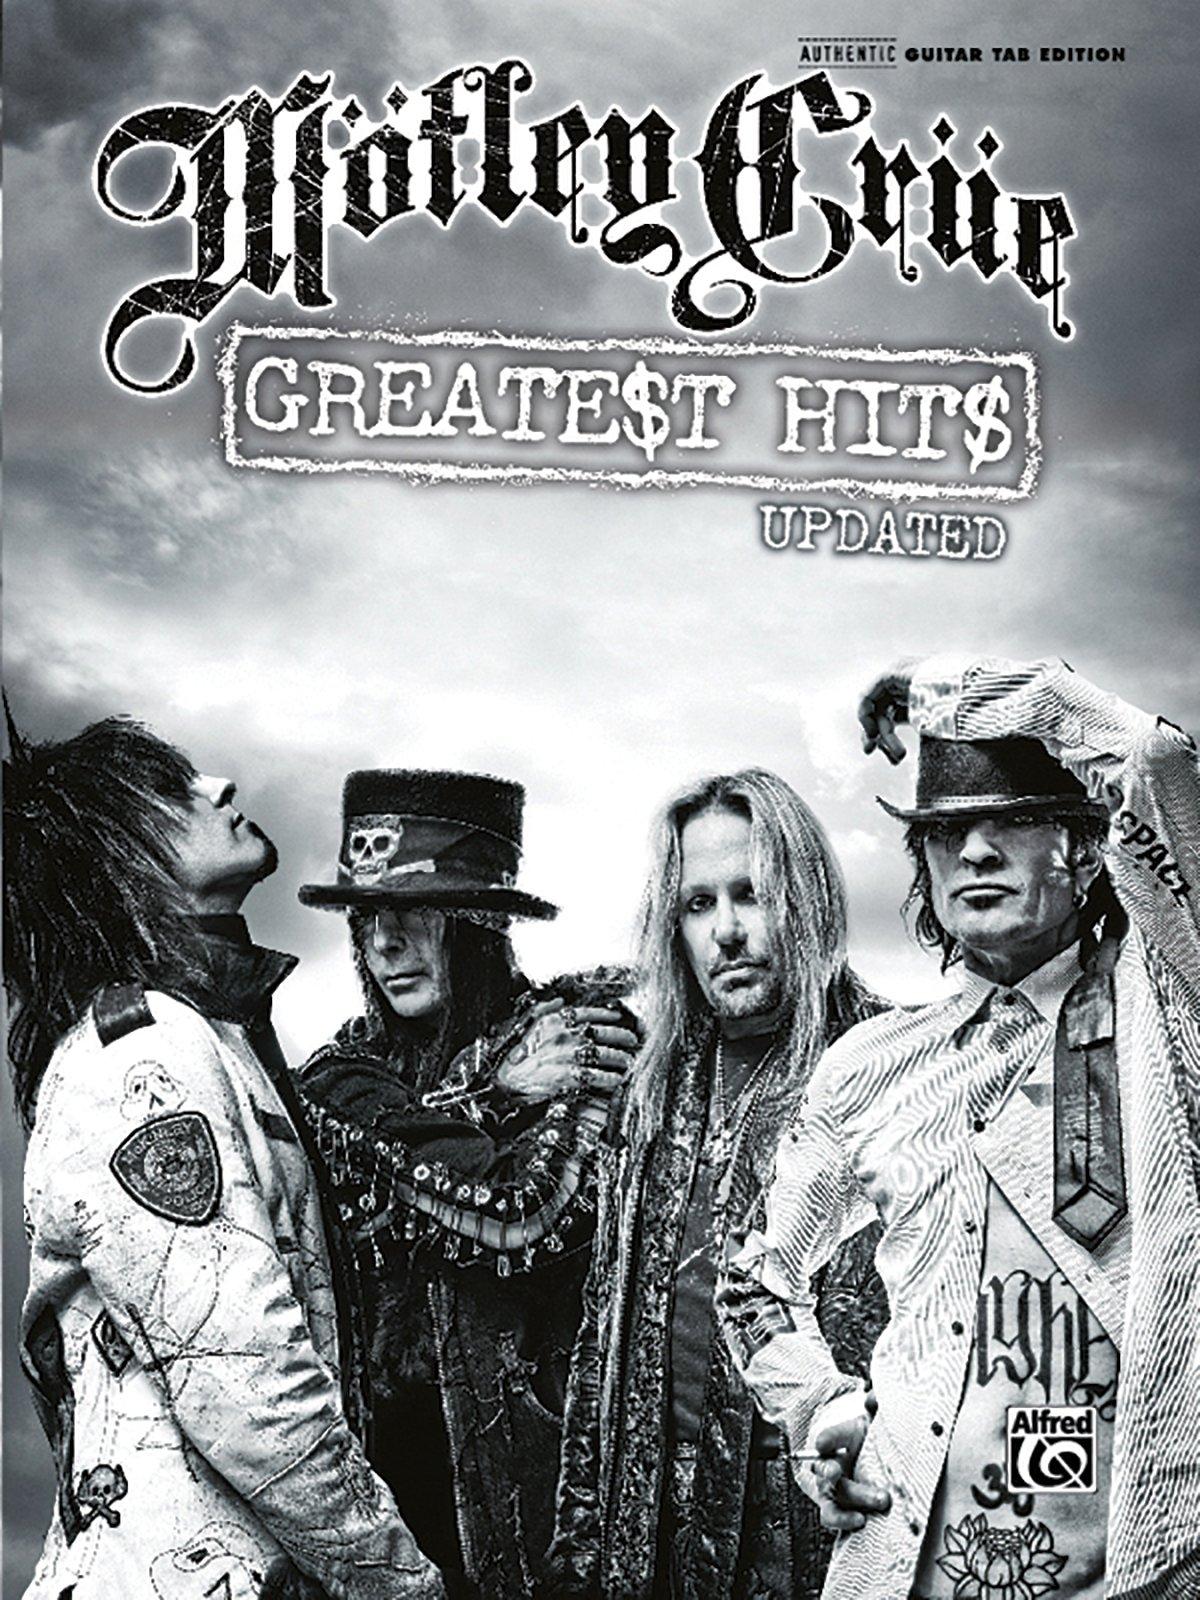 Download Motley Crue Greatest Hits: Authentic Guitar TAB (Guitar Tab Editions) pdf